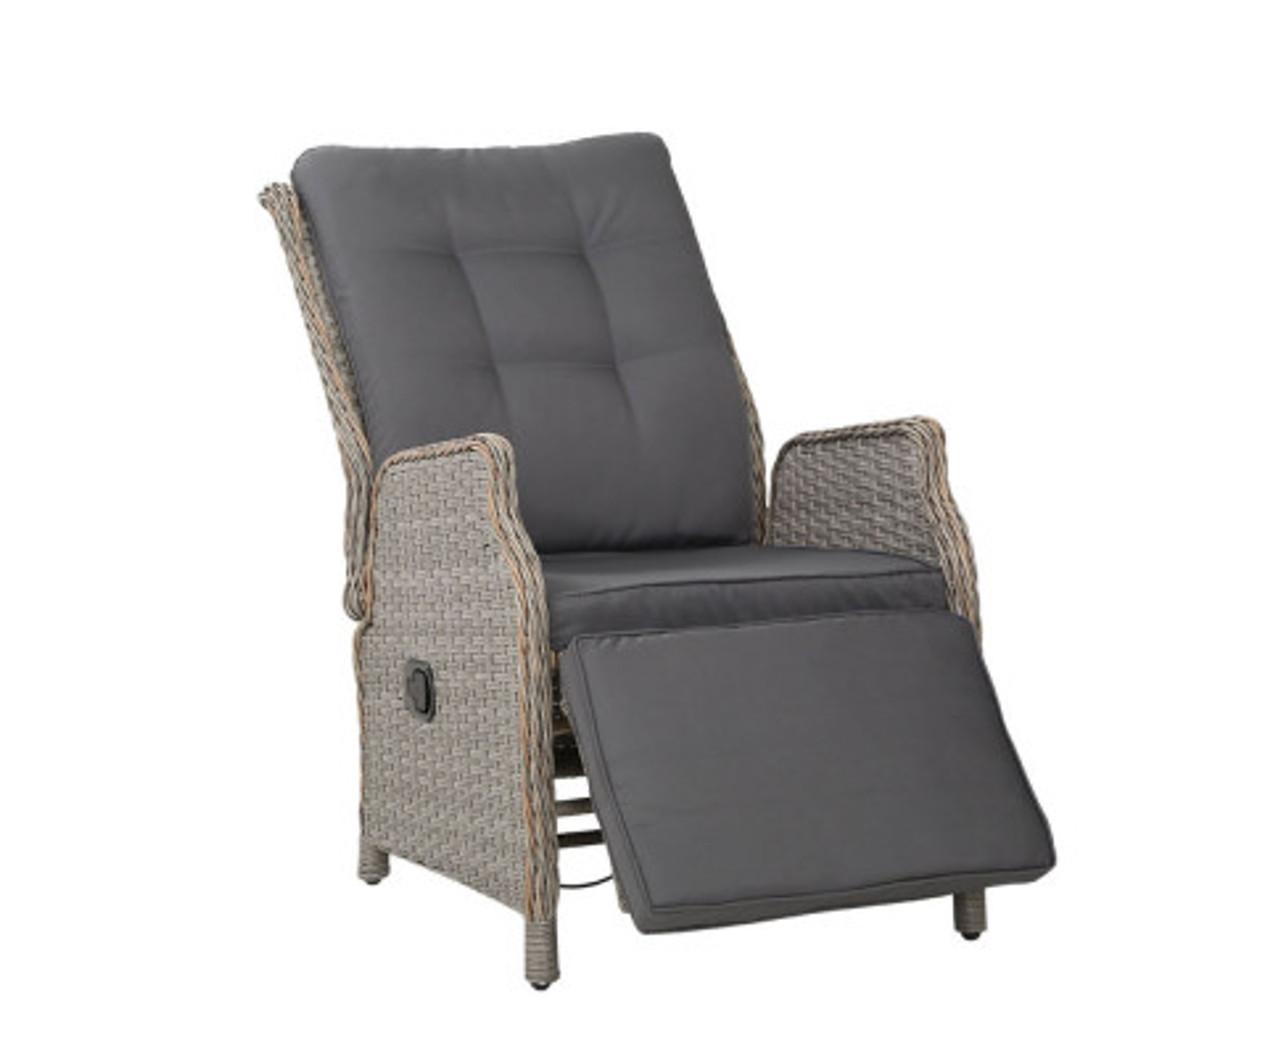 mosman sun lounge recliner patio chair